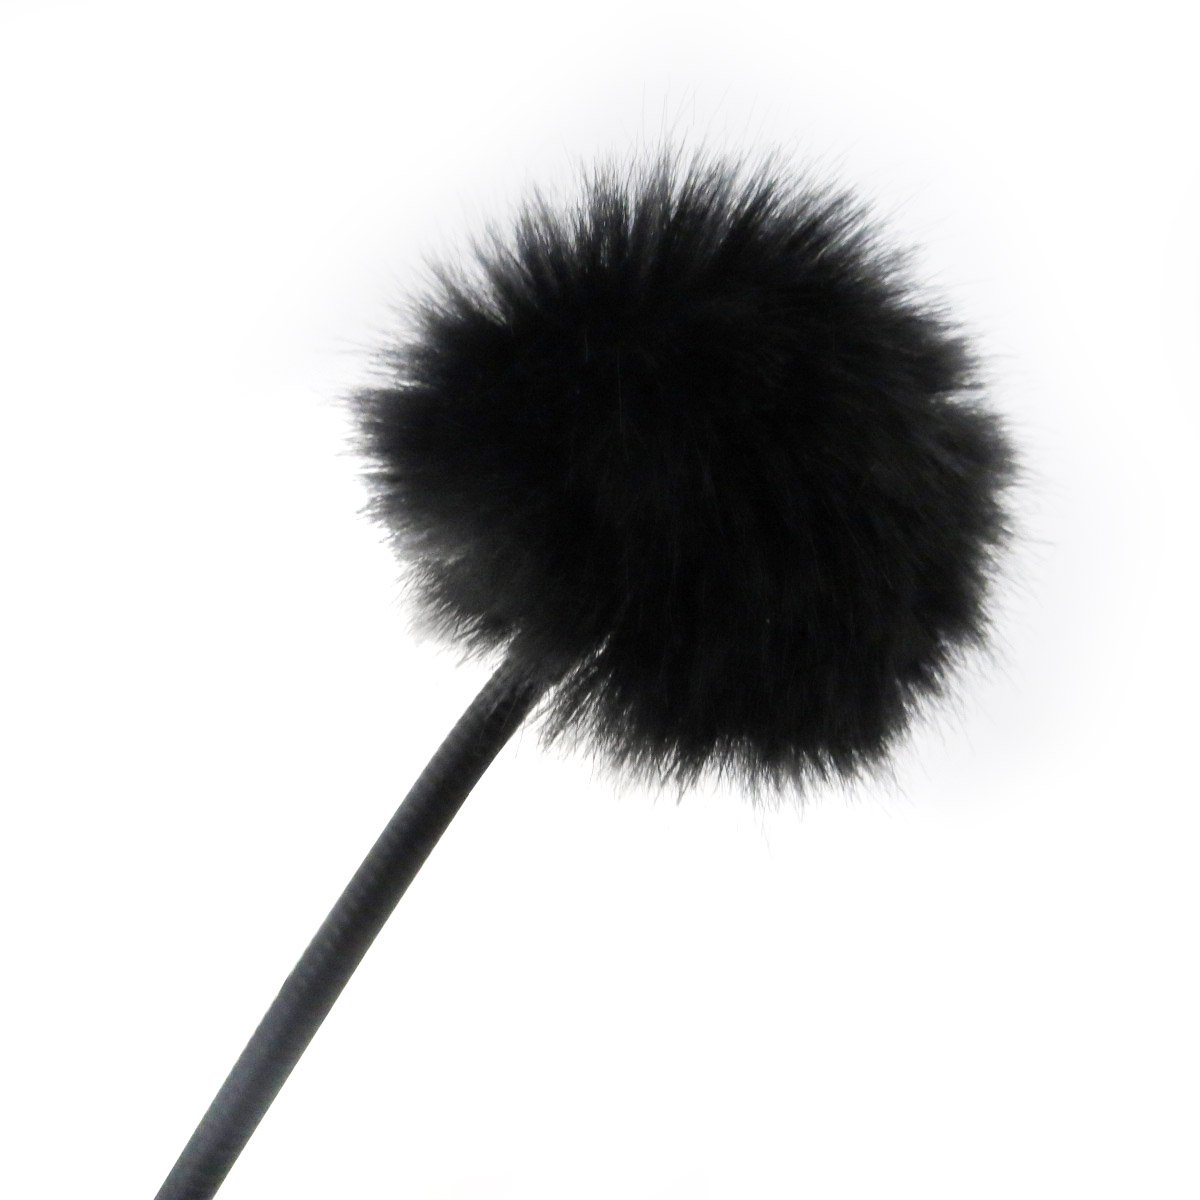 KEEPDRUM WS05 - Mini Fell-Windschutz für Lavaliermikrofone